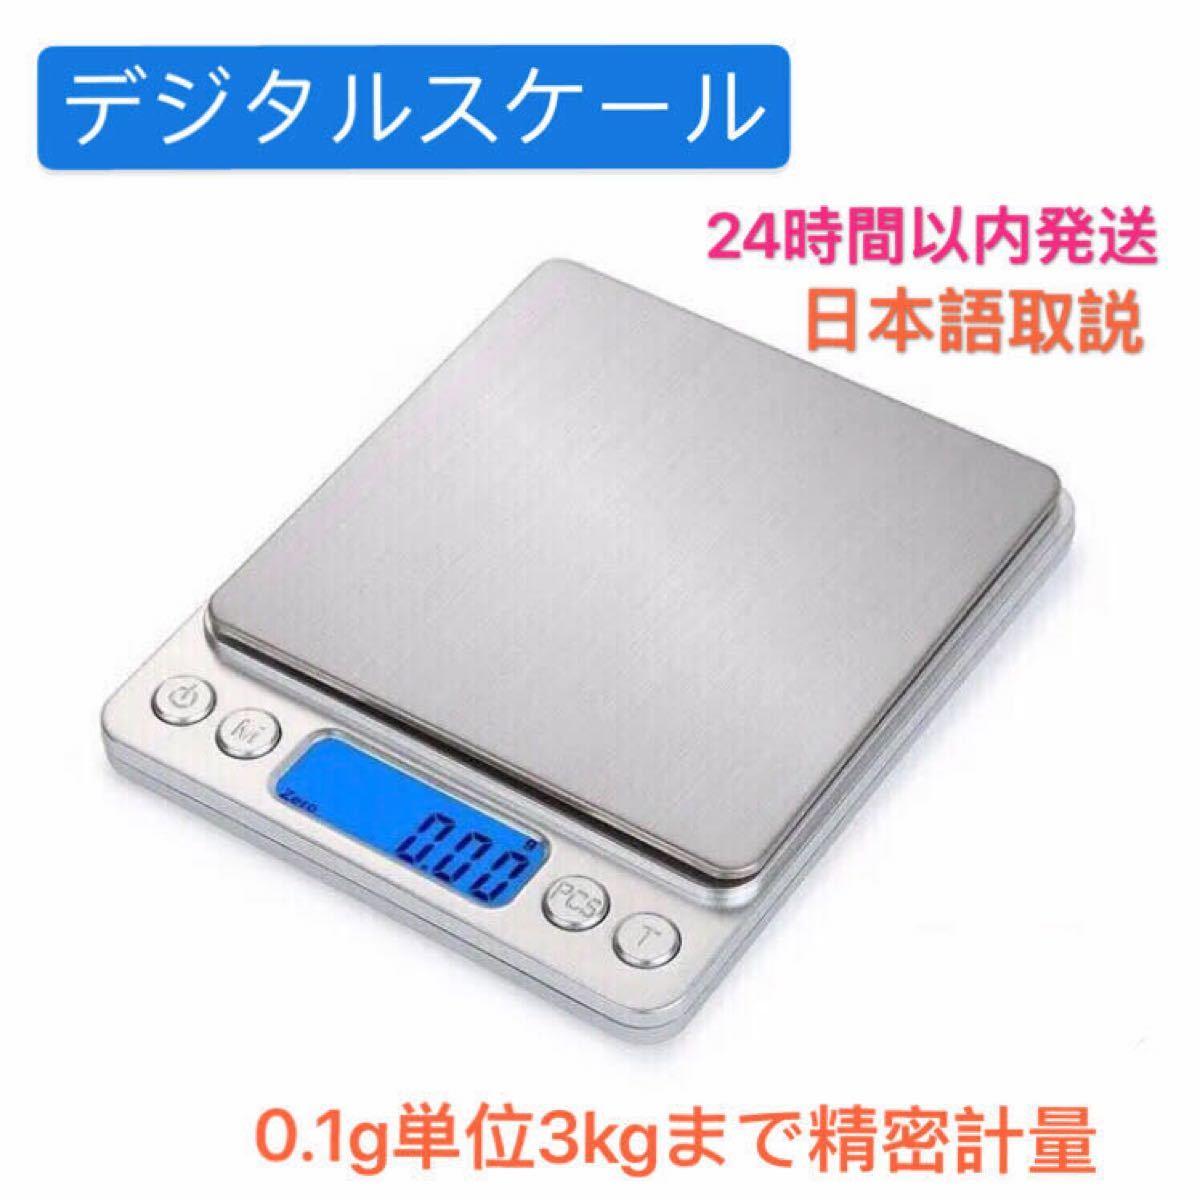 3kg/0.1gデジタルスケールキッチンクッキングお菓子料理郵便物はかり秤計量器